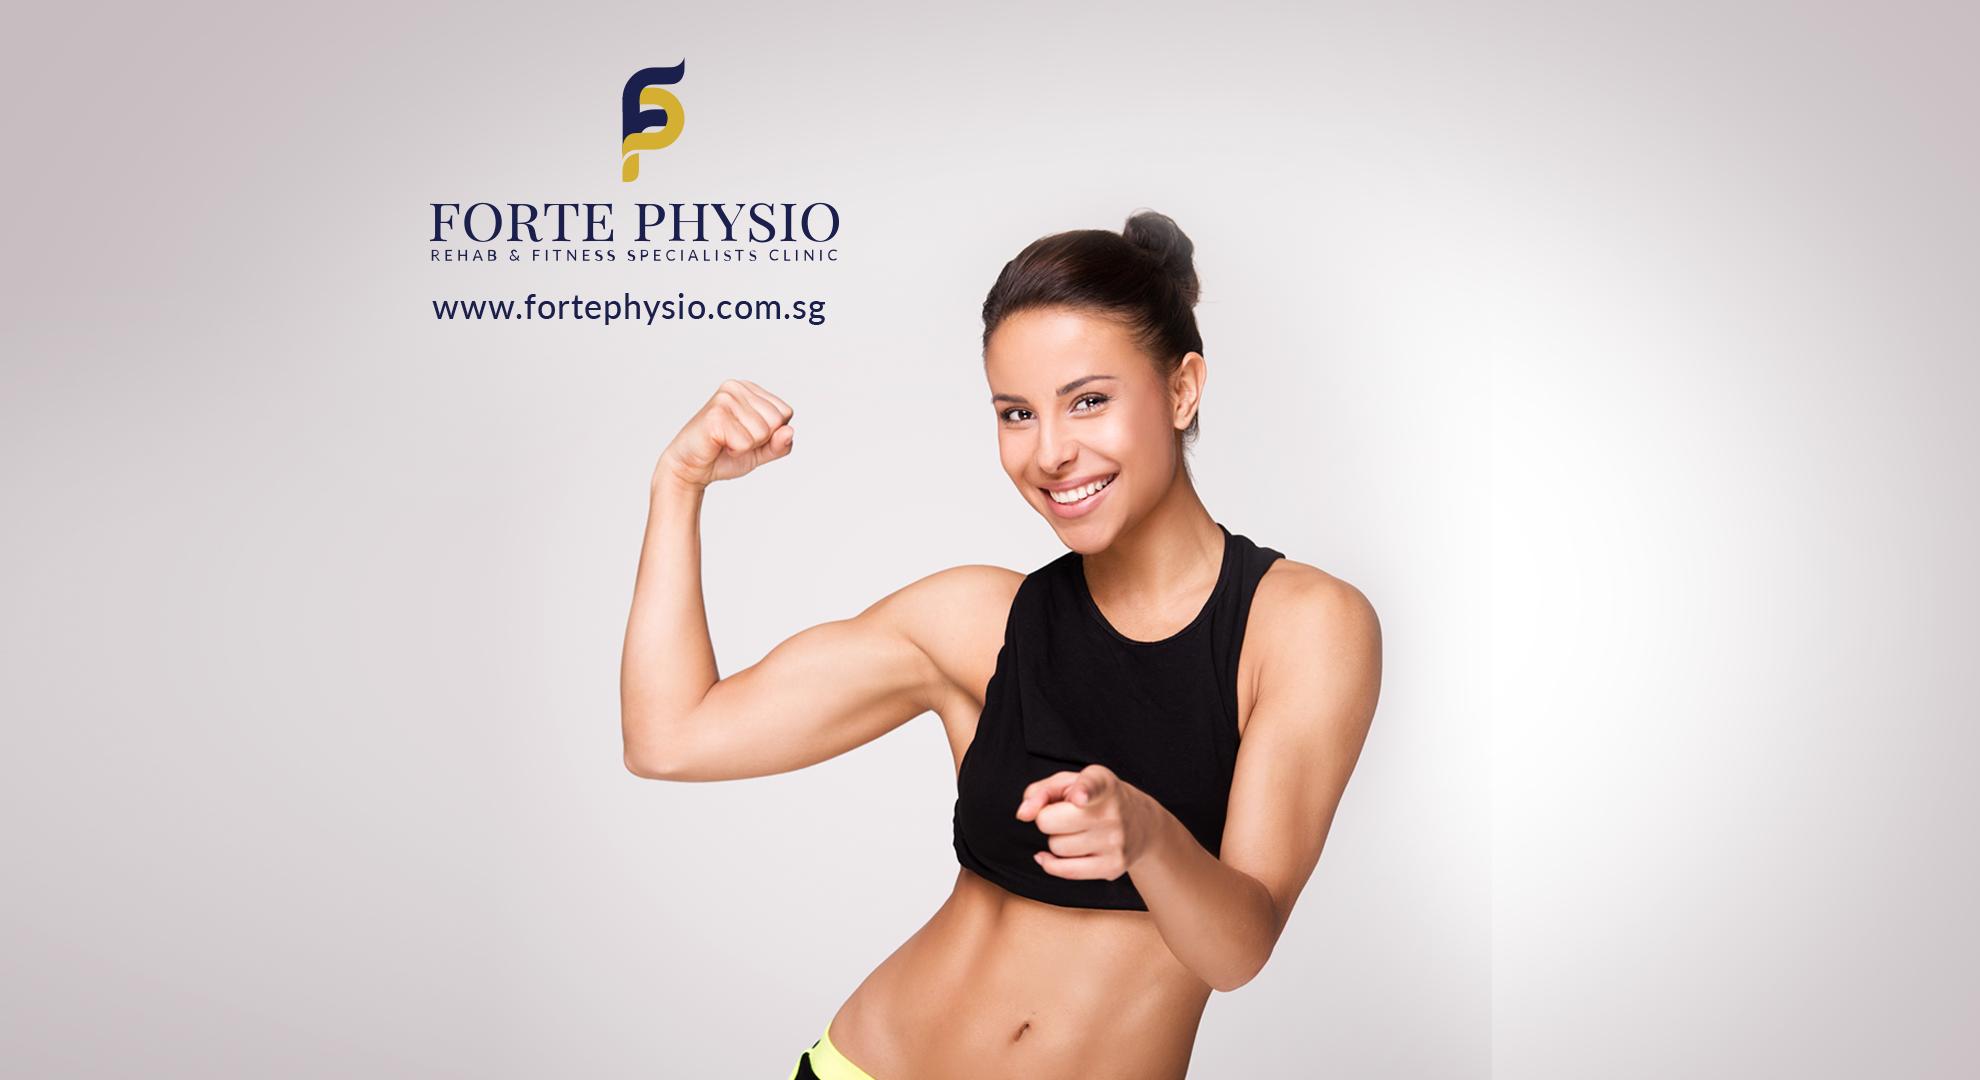 Forte Physio